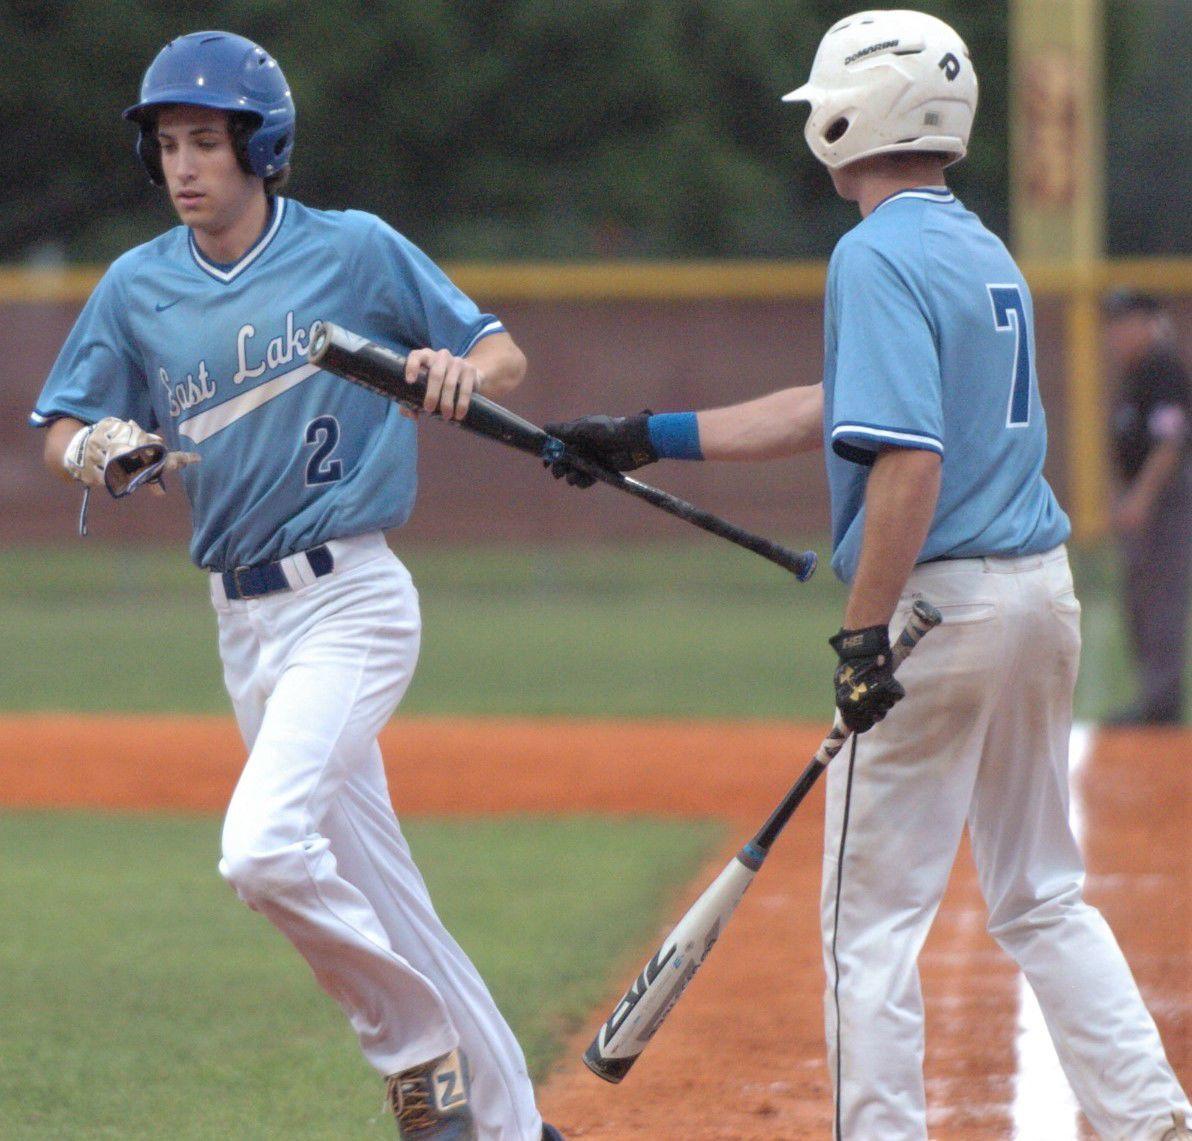 East Lake baseball putting it all together